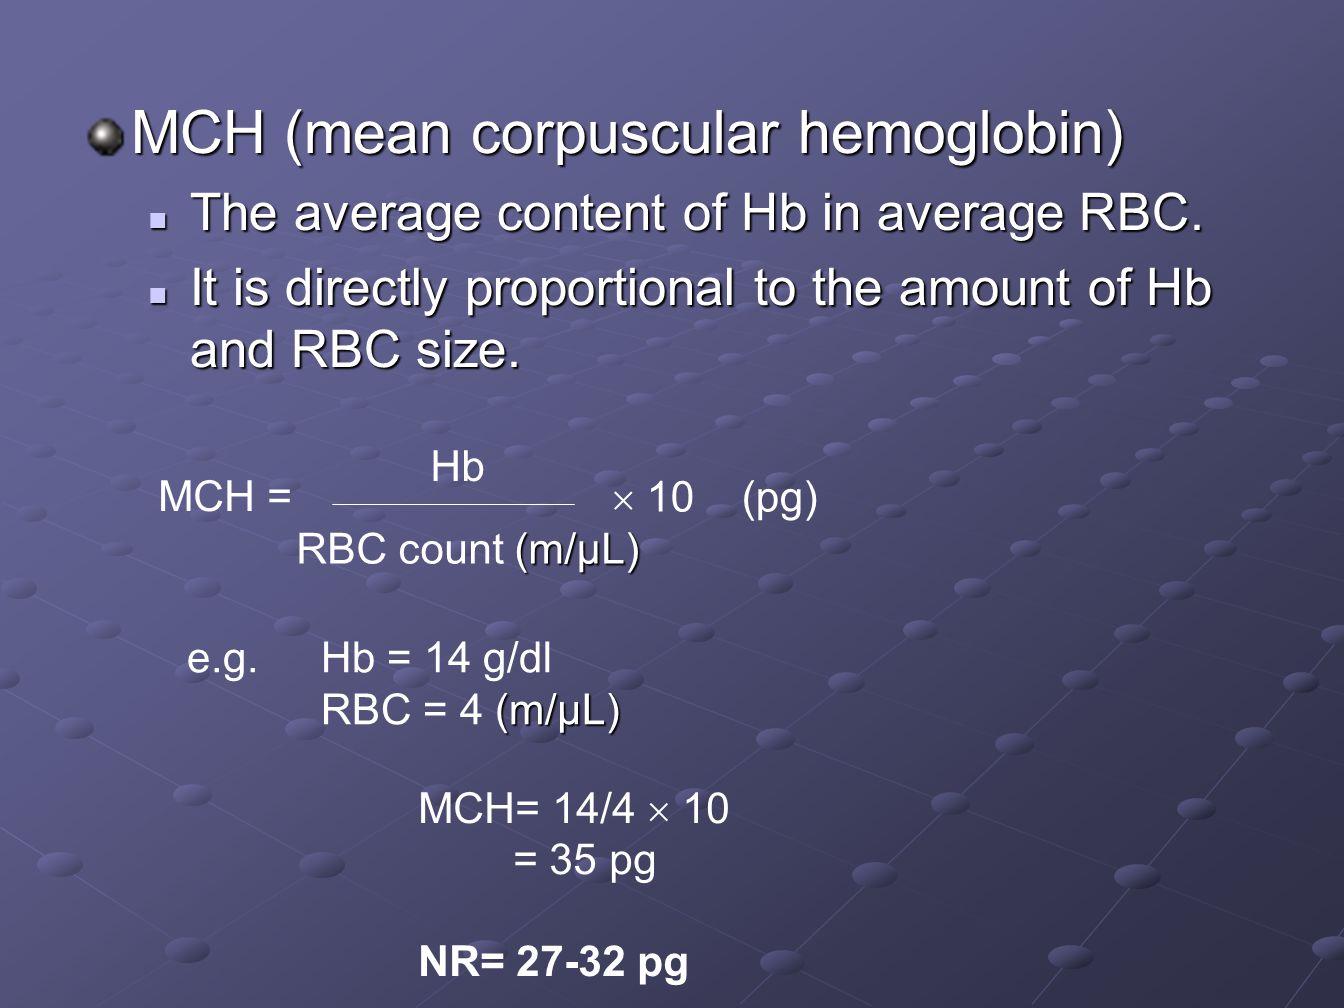 MCHC (mean corpuscular hemoglobin concentration) Express the average concentration of hemoglobin per unit volume of RBC.